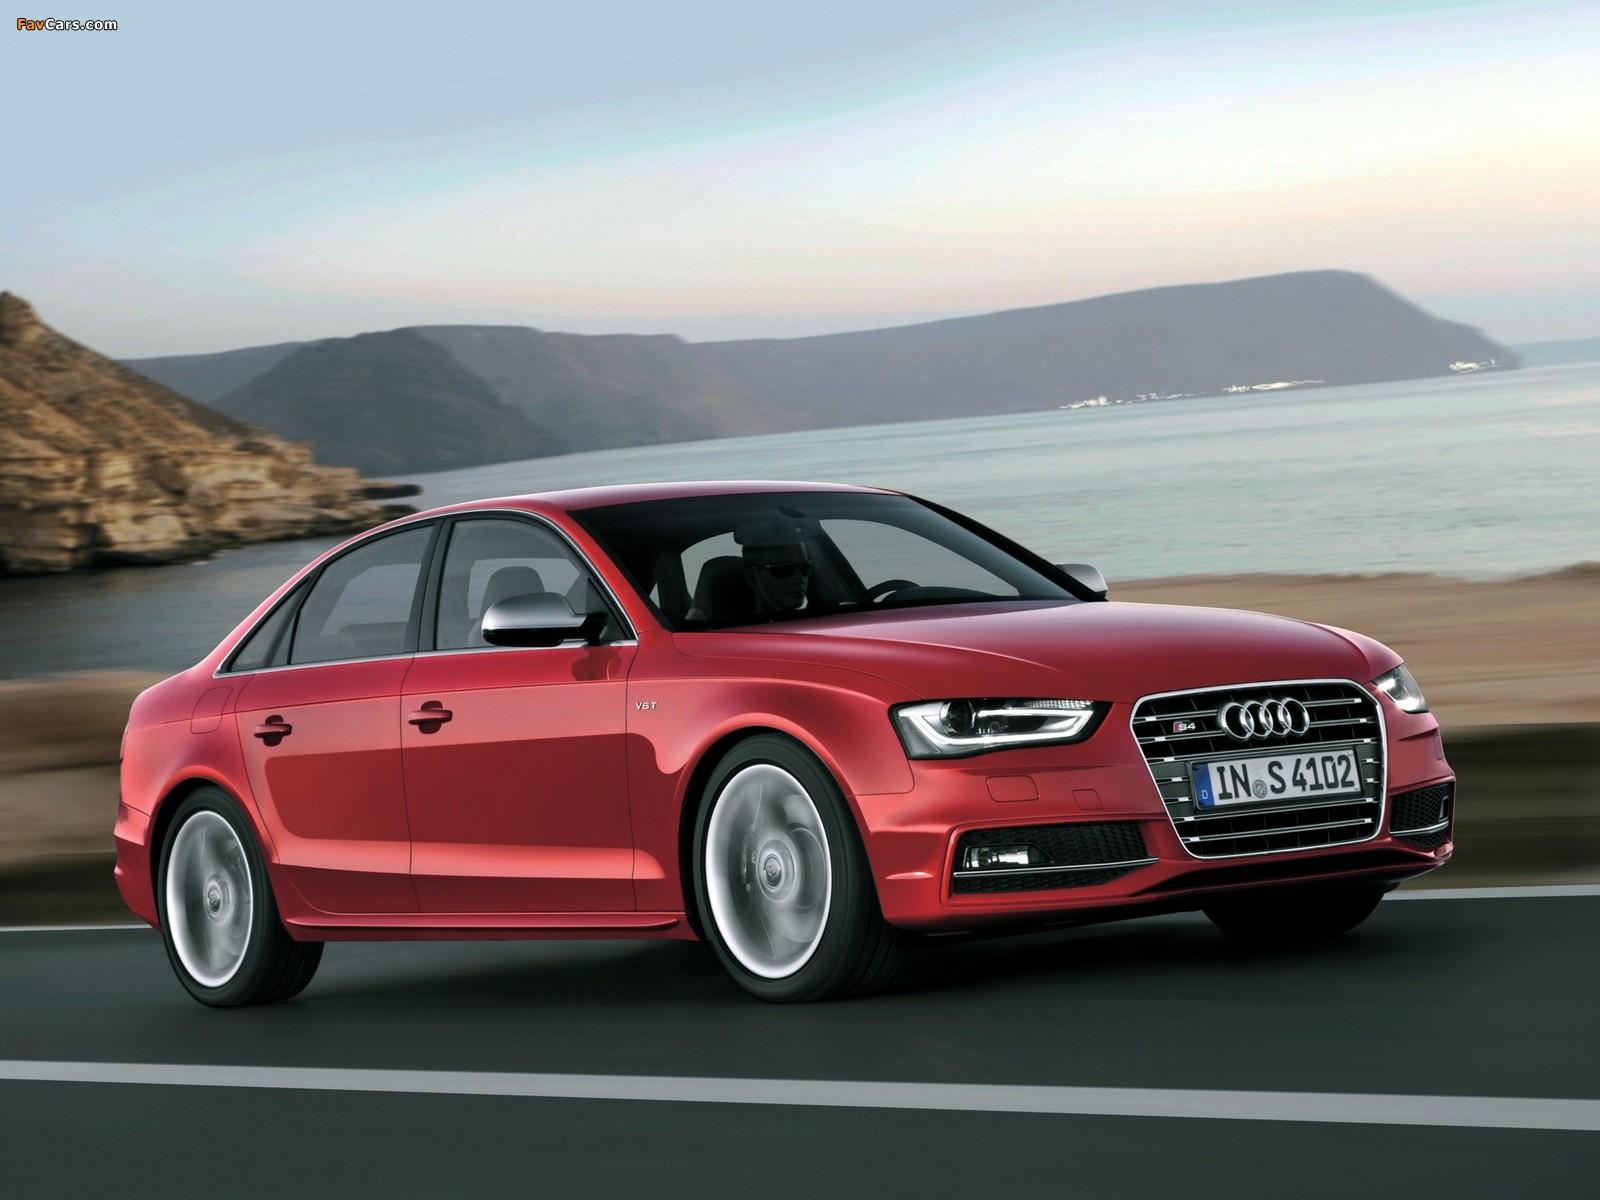 Audi S4 Sedan B8 8k 2012 Wallpapers 1600x1200